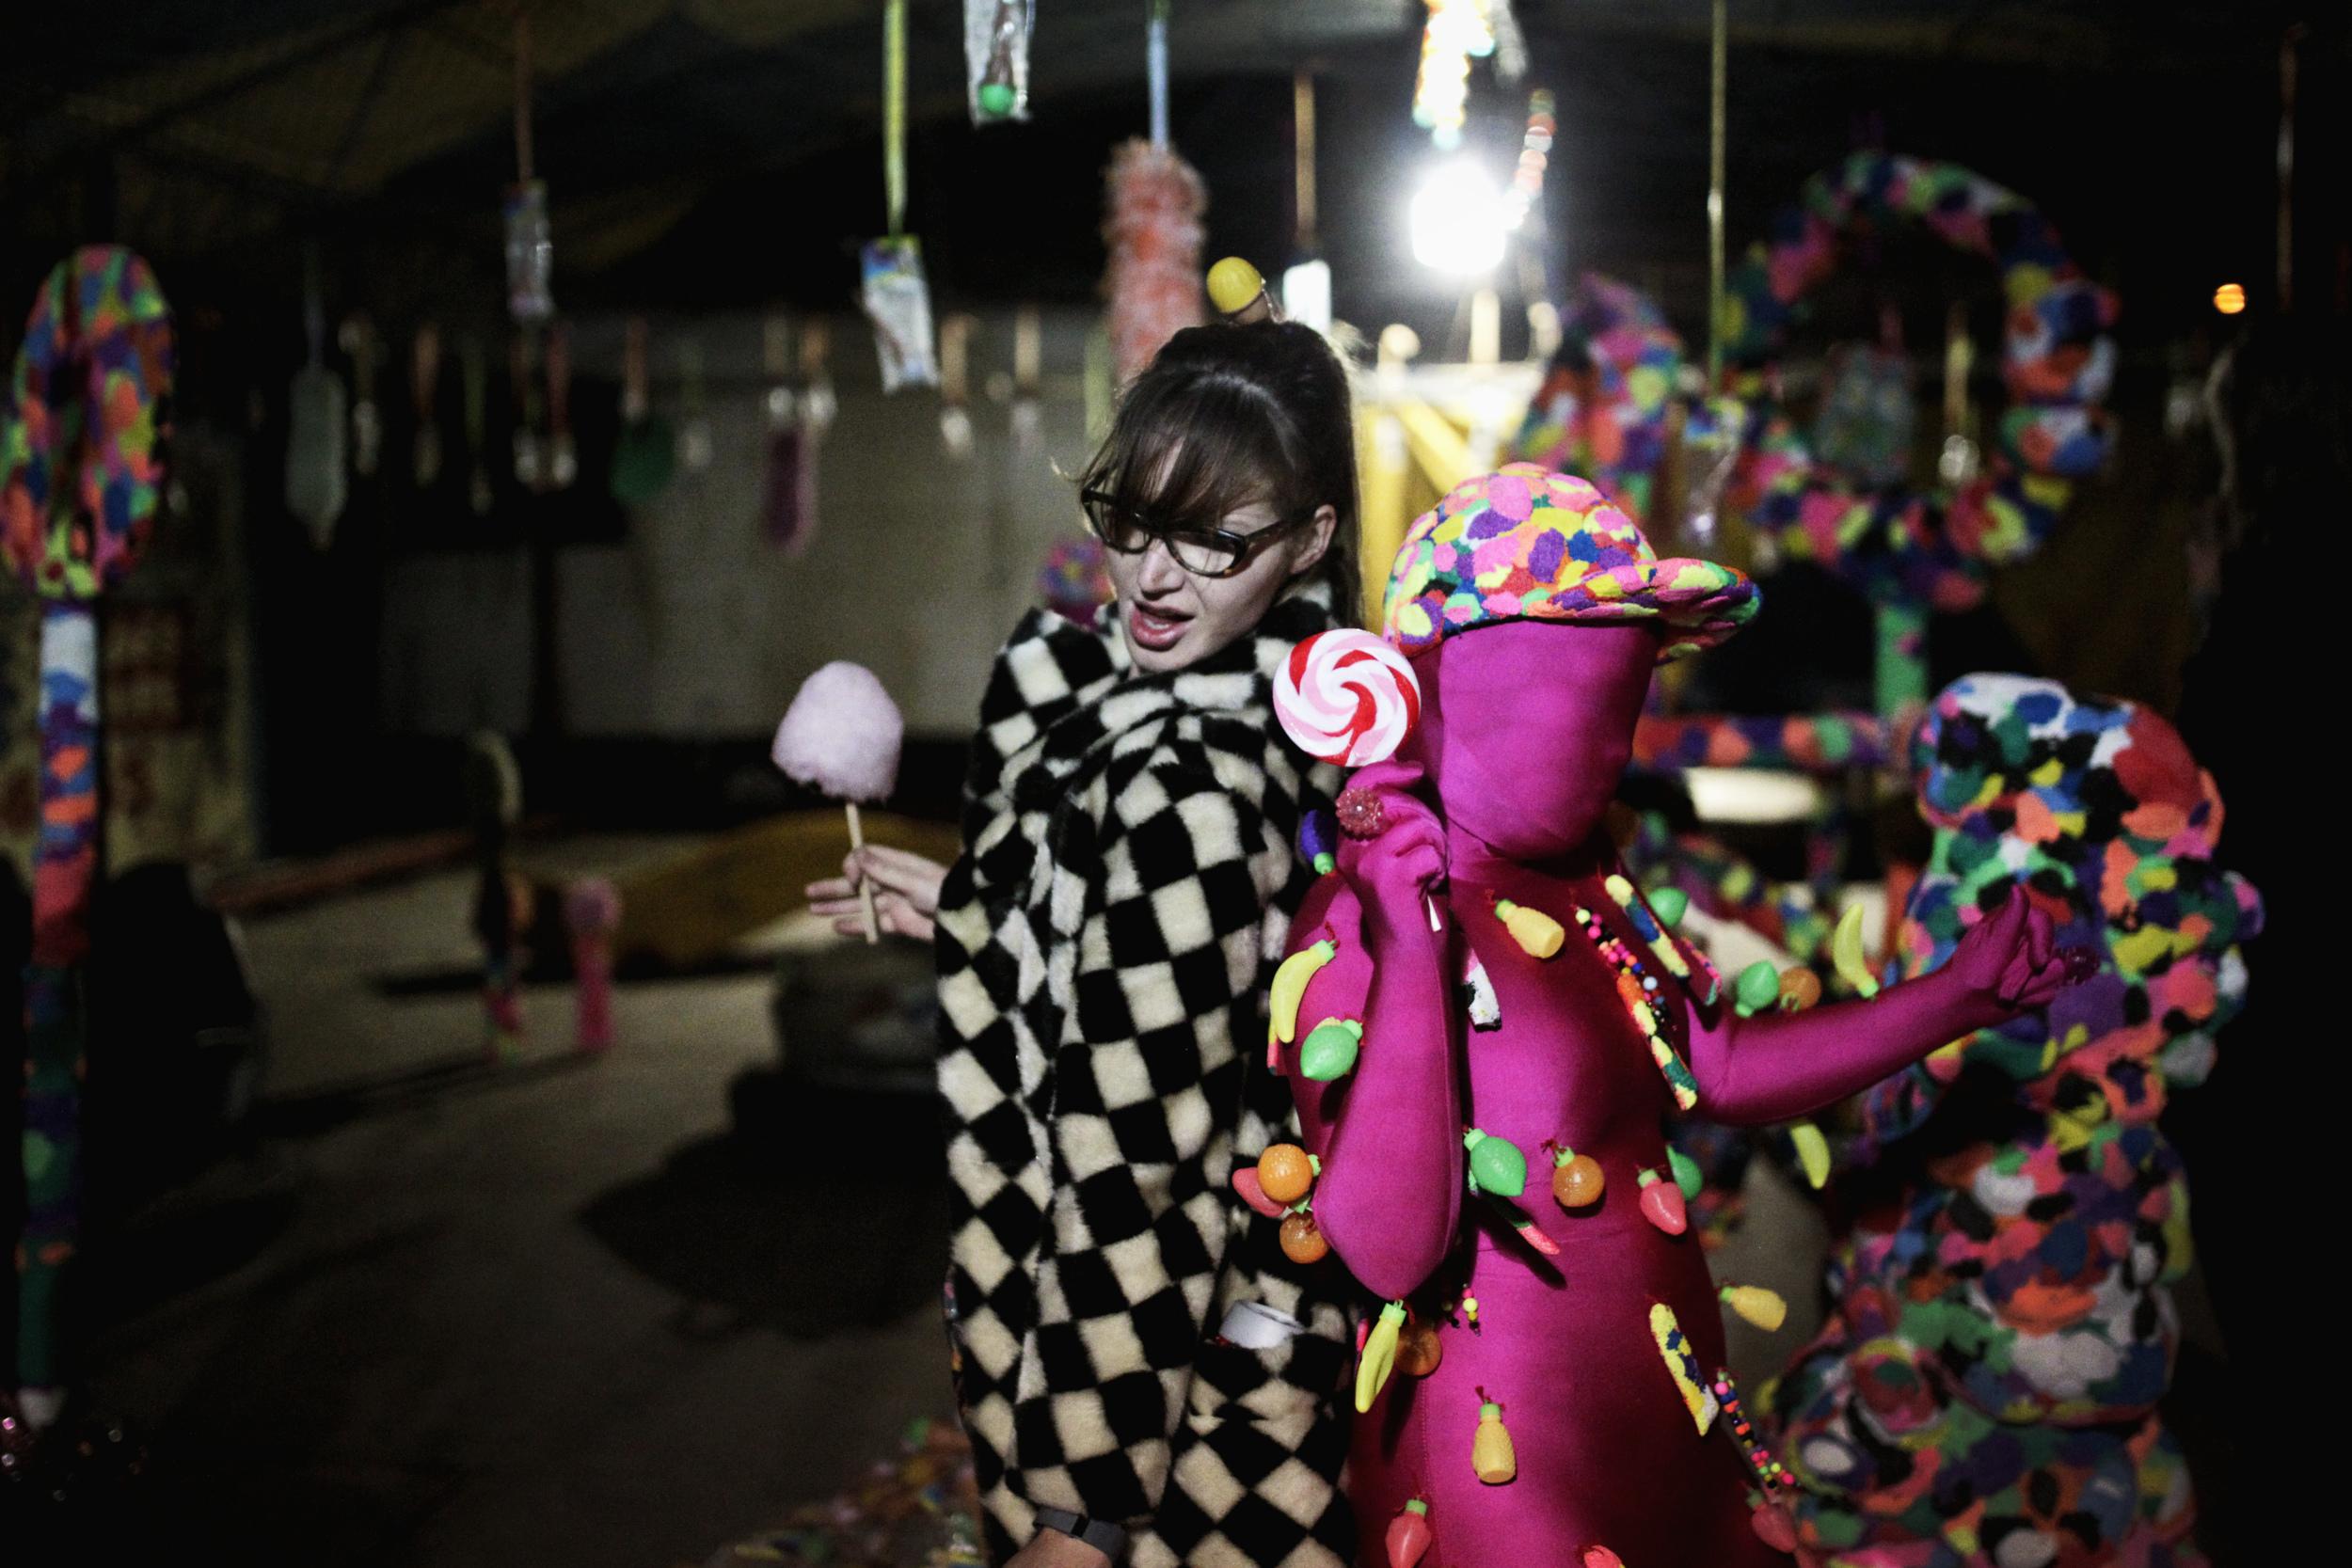 Dancing in Rosie Deacon's art installation 'Candy Shop'